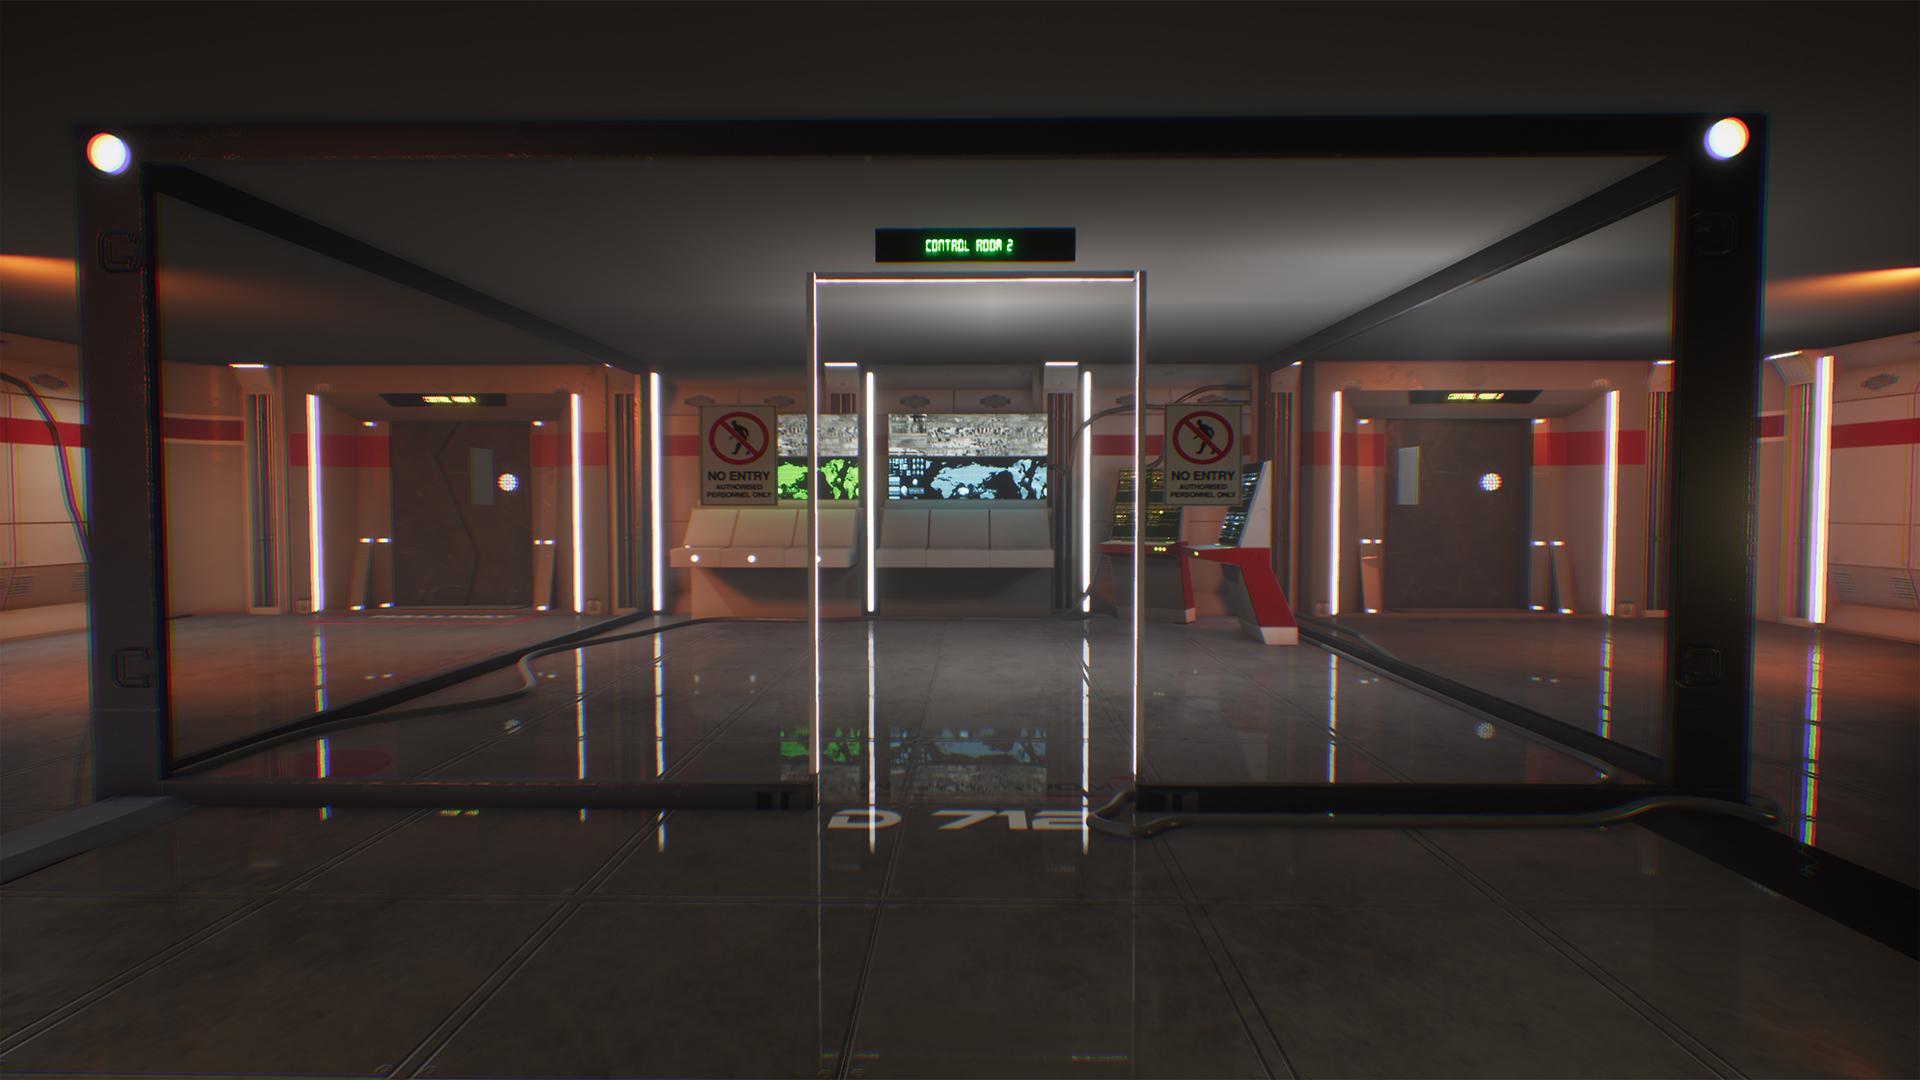 Sci-fi Control Room Game Ready